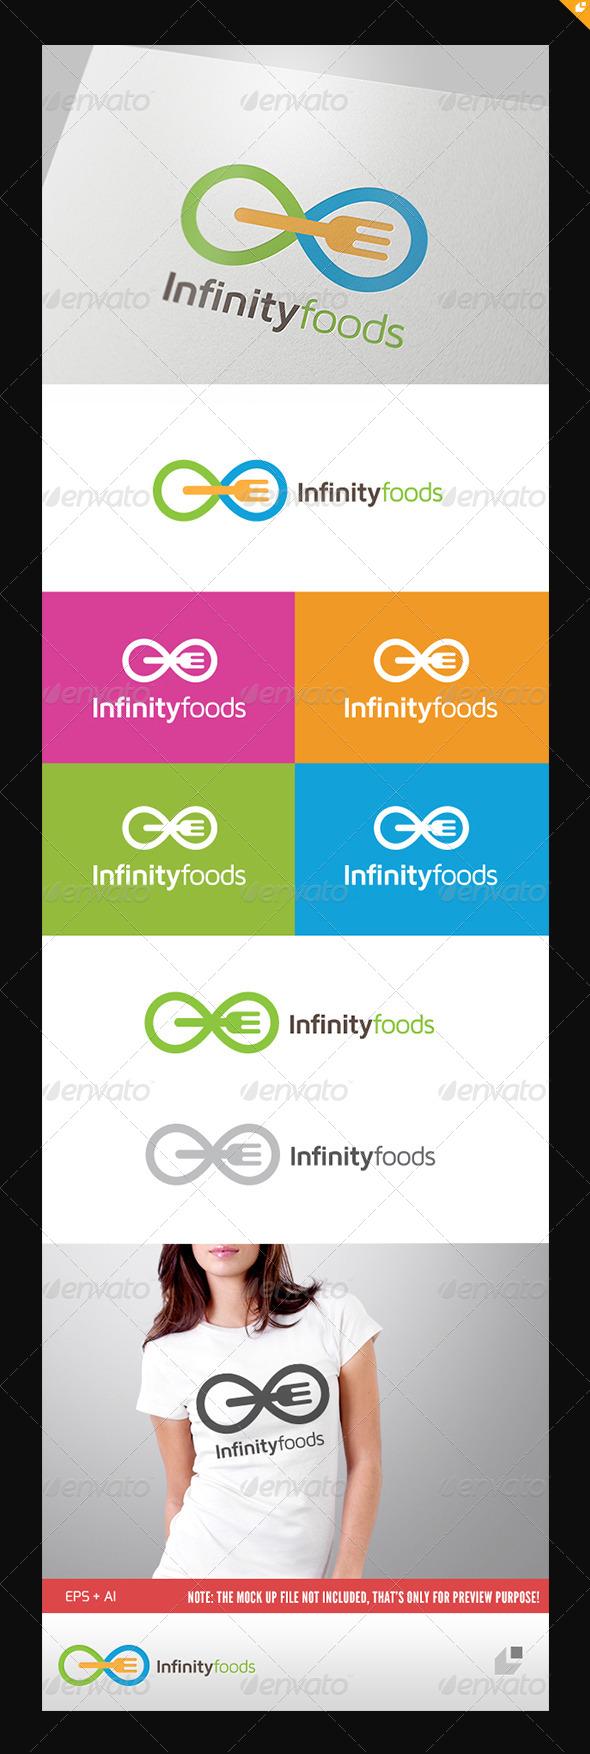 Infinity Foods Logo